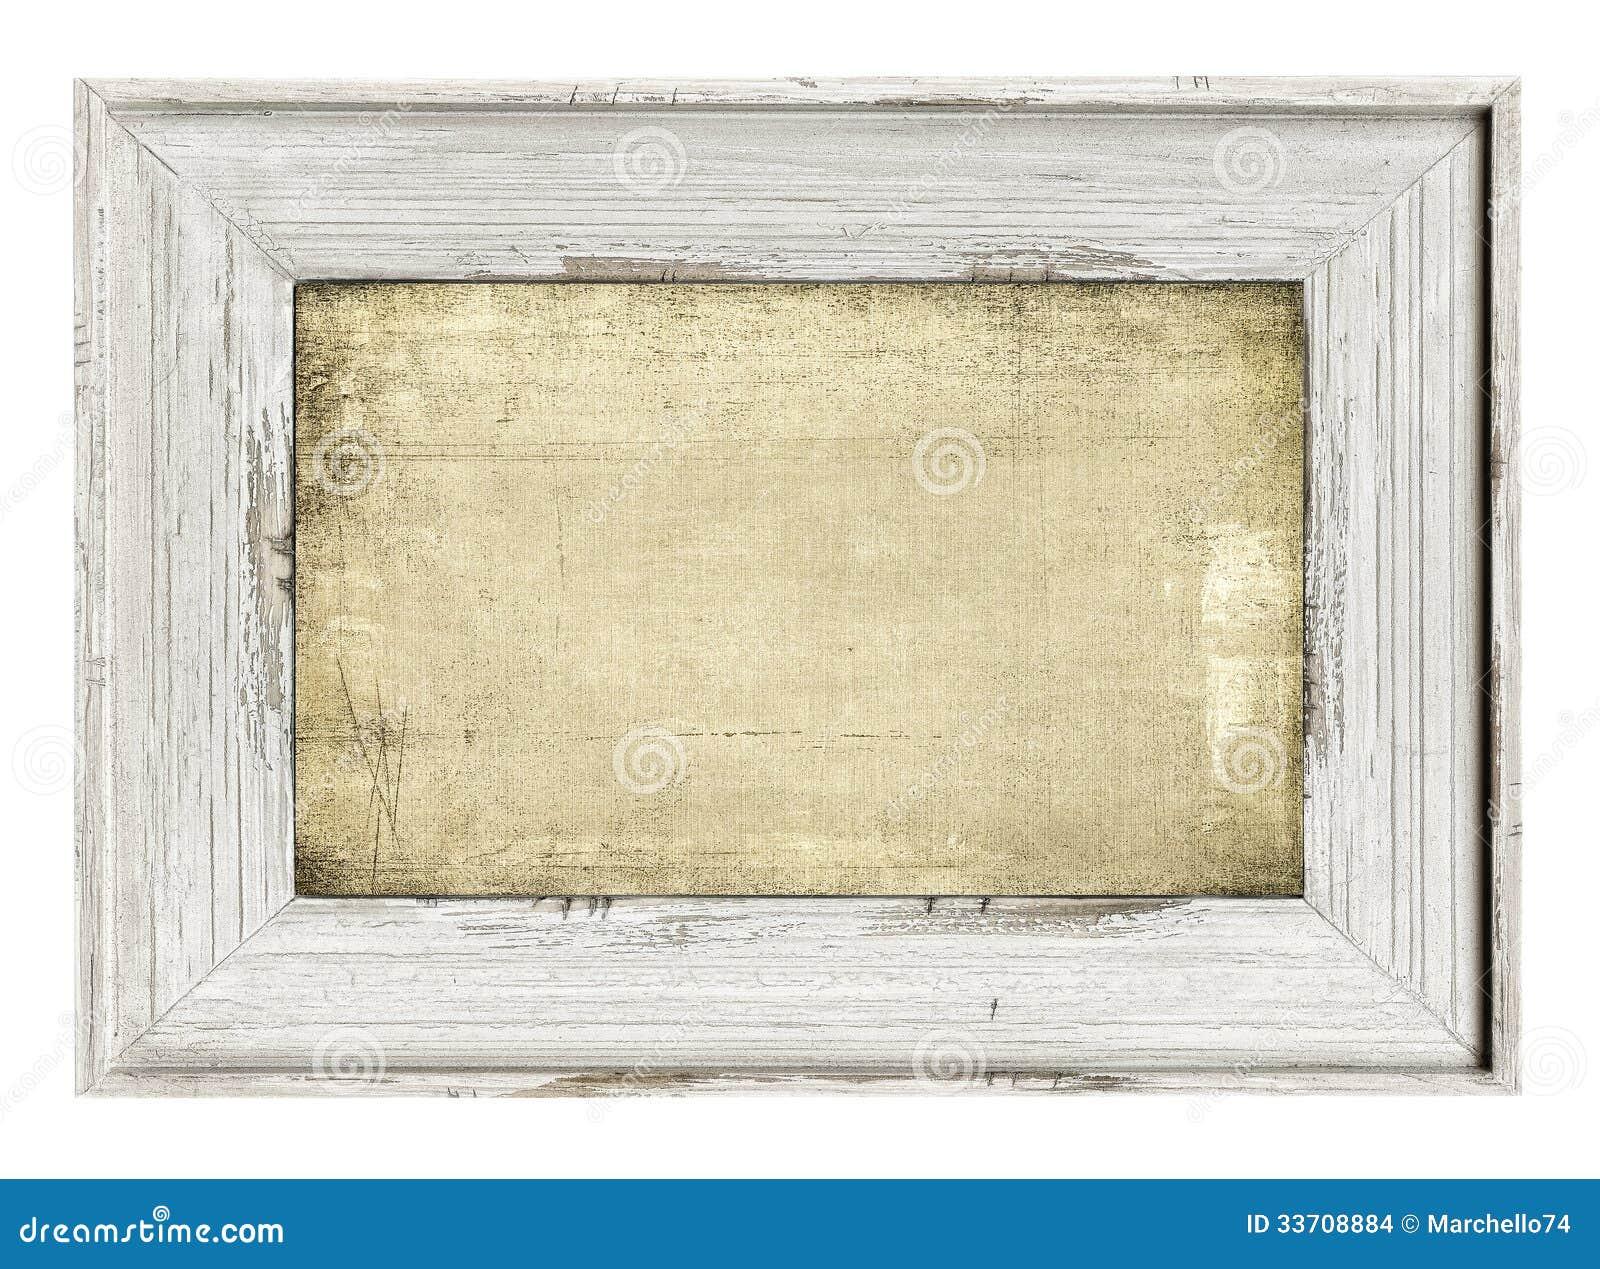 Bilderrahmen holz set bilderrahmen ideen - Pintar madera blanco ...